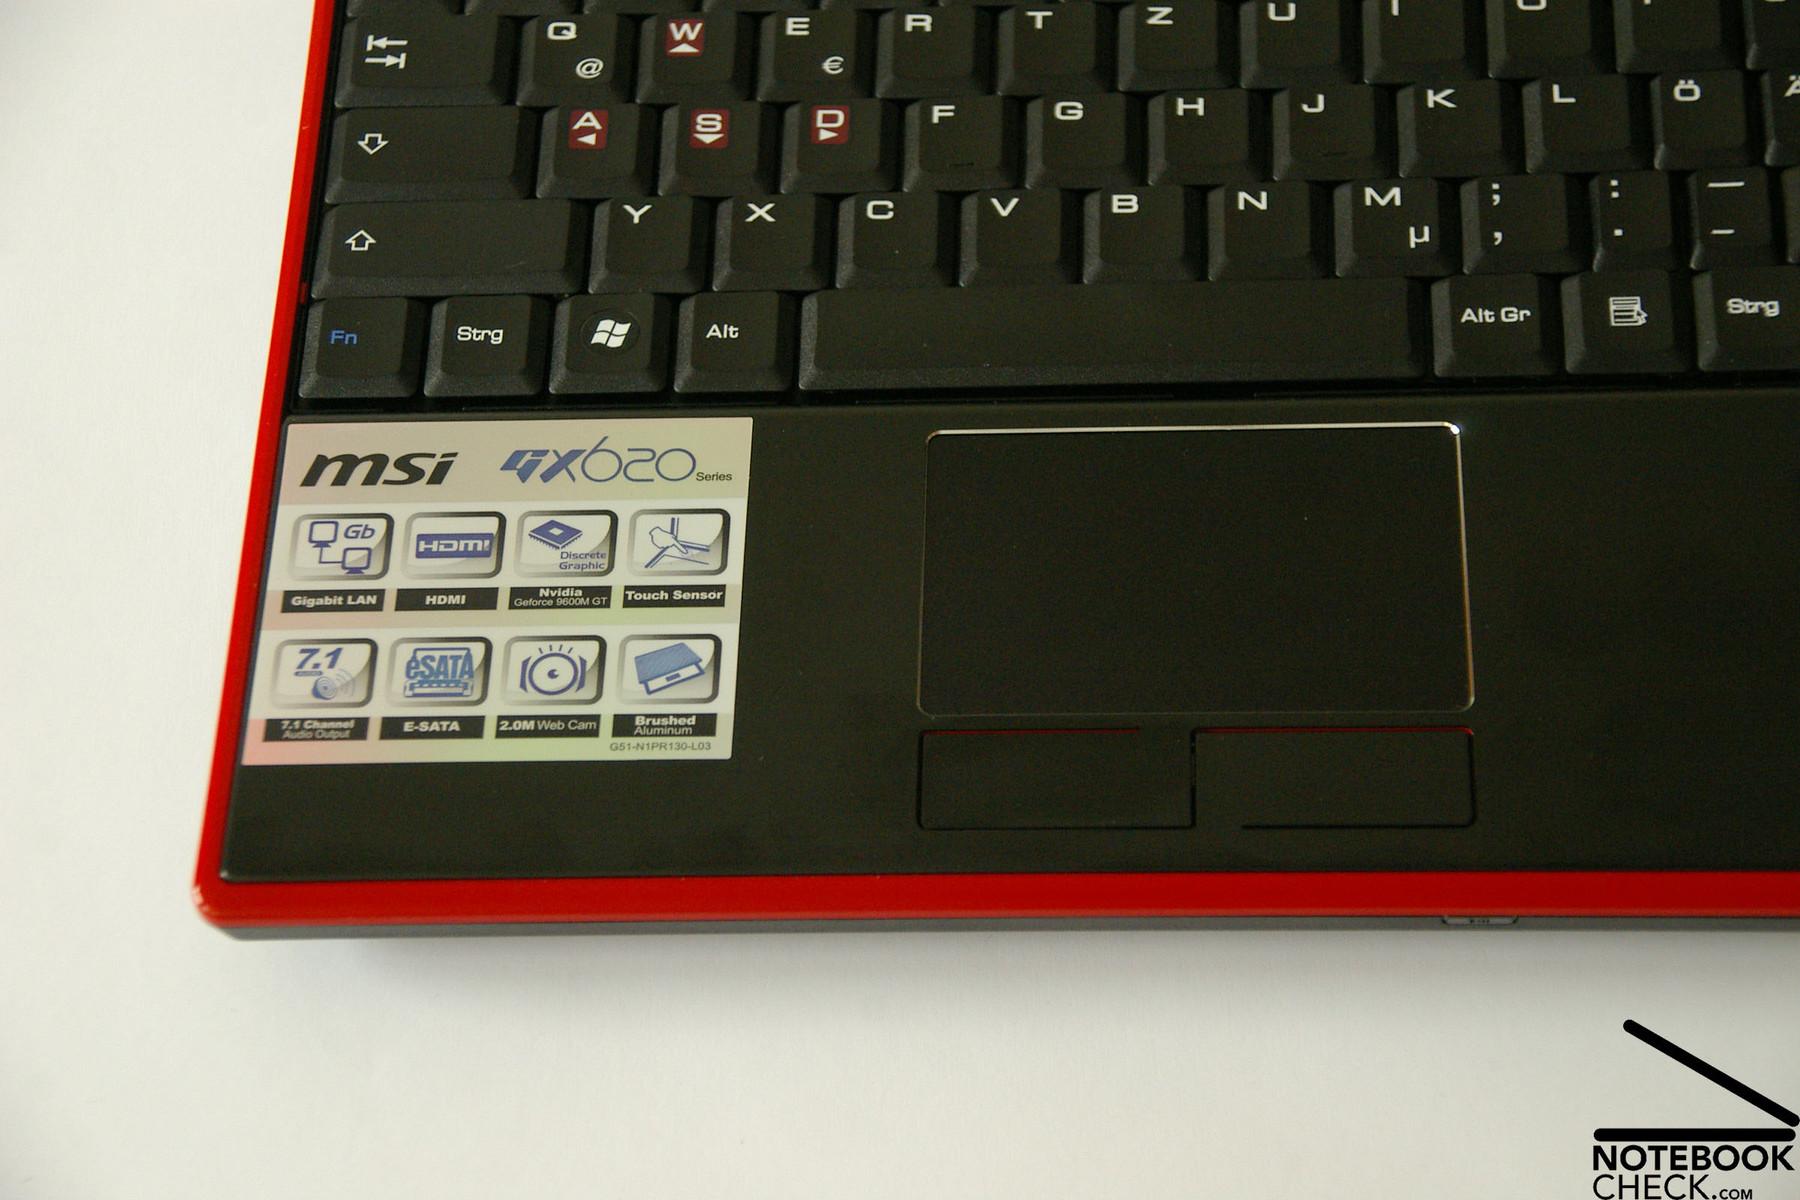 MSI GX620 VGA Vista